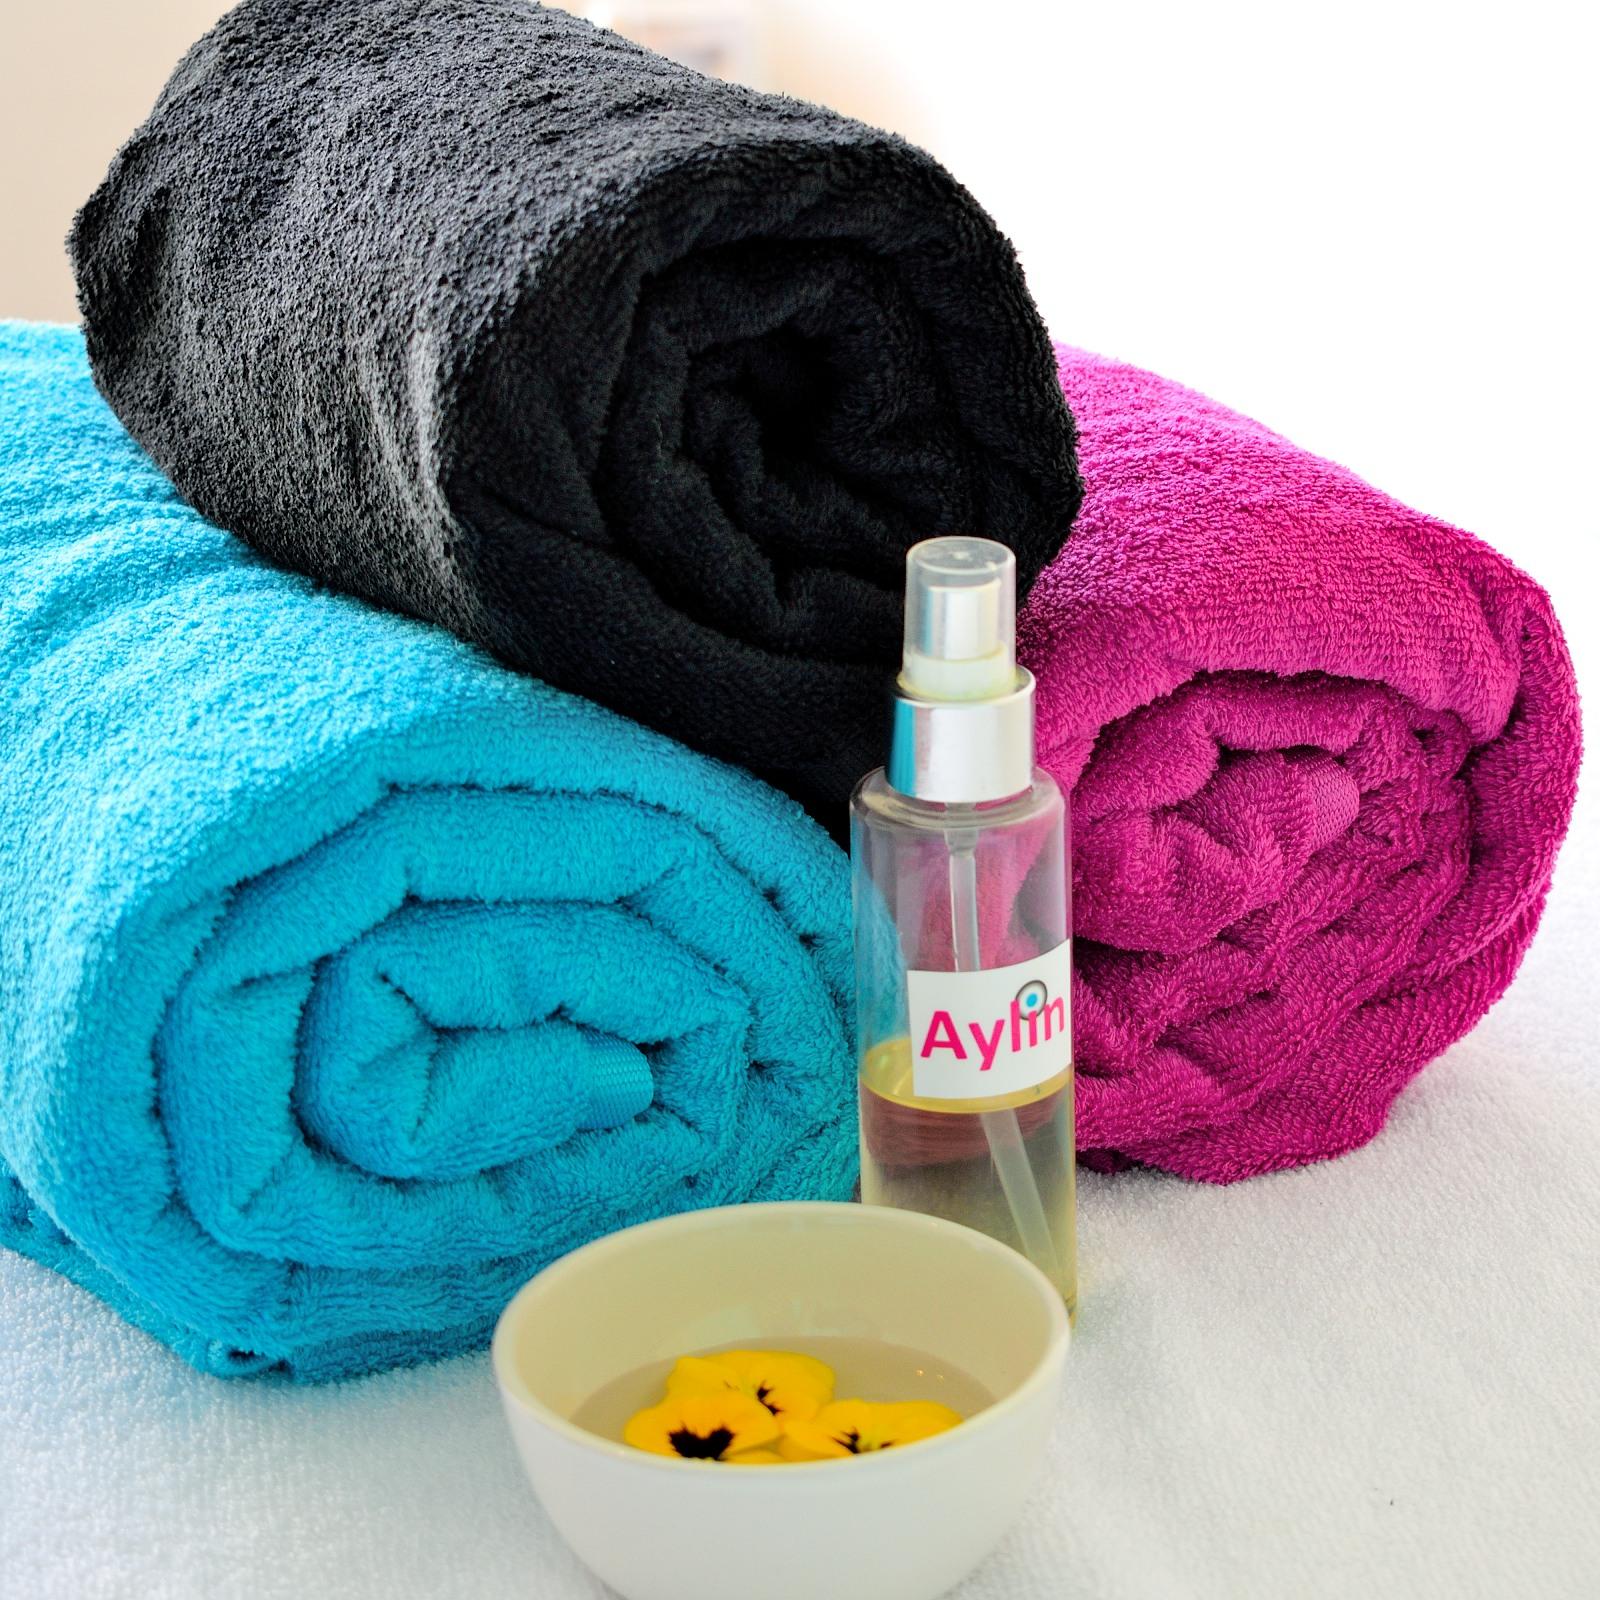 Massagepraktijk Aylin